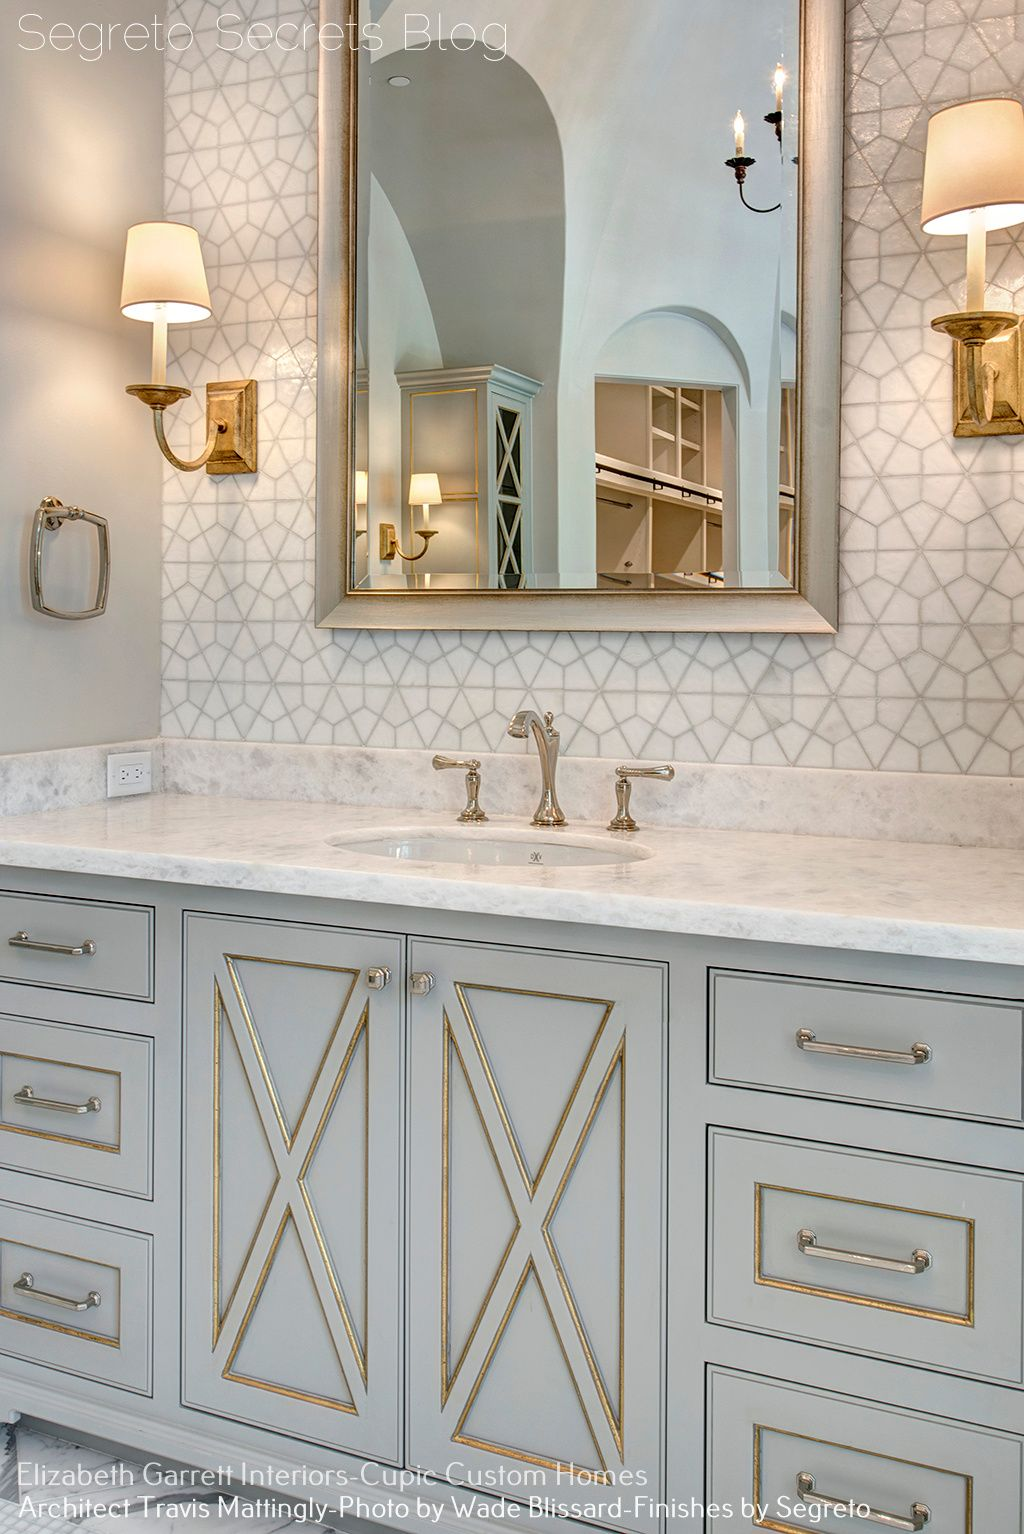 A Showcase To Remember Part 2 Segreto Finishes Elegant Bathroom Basement Bathroom Design Houston Interior Designers